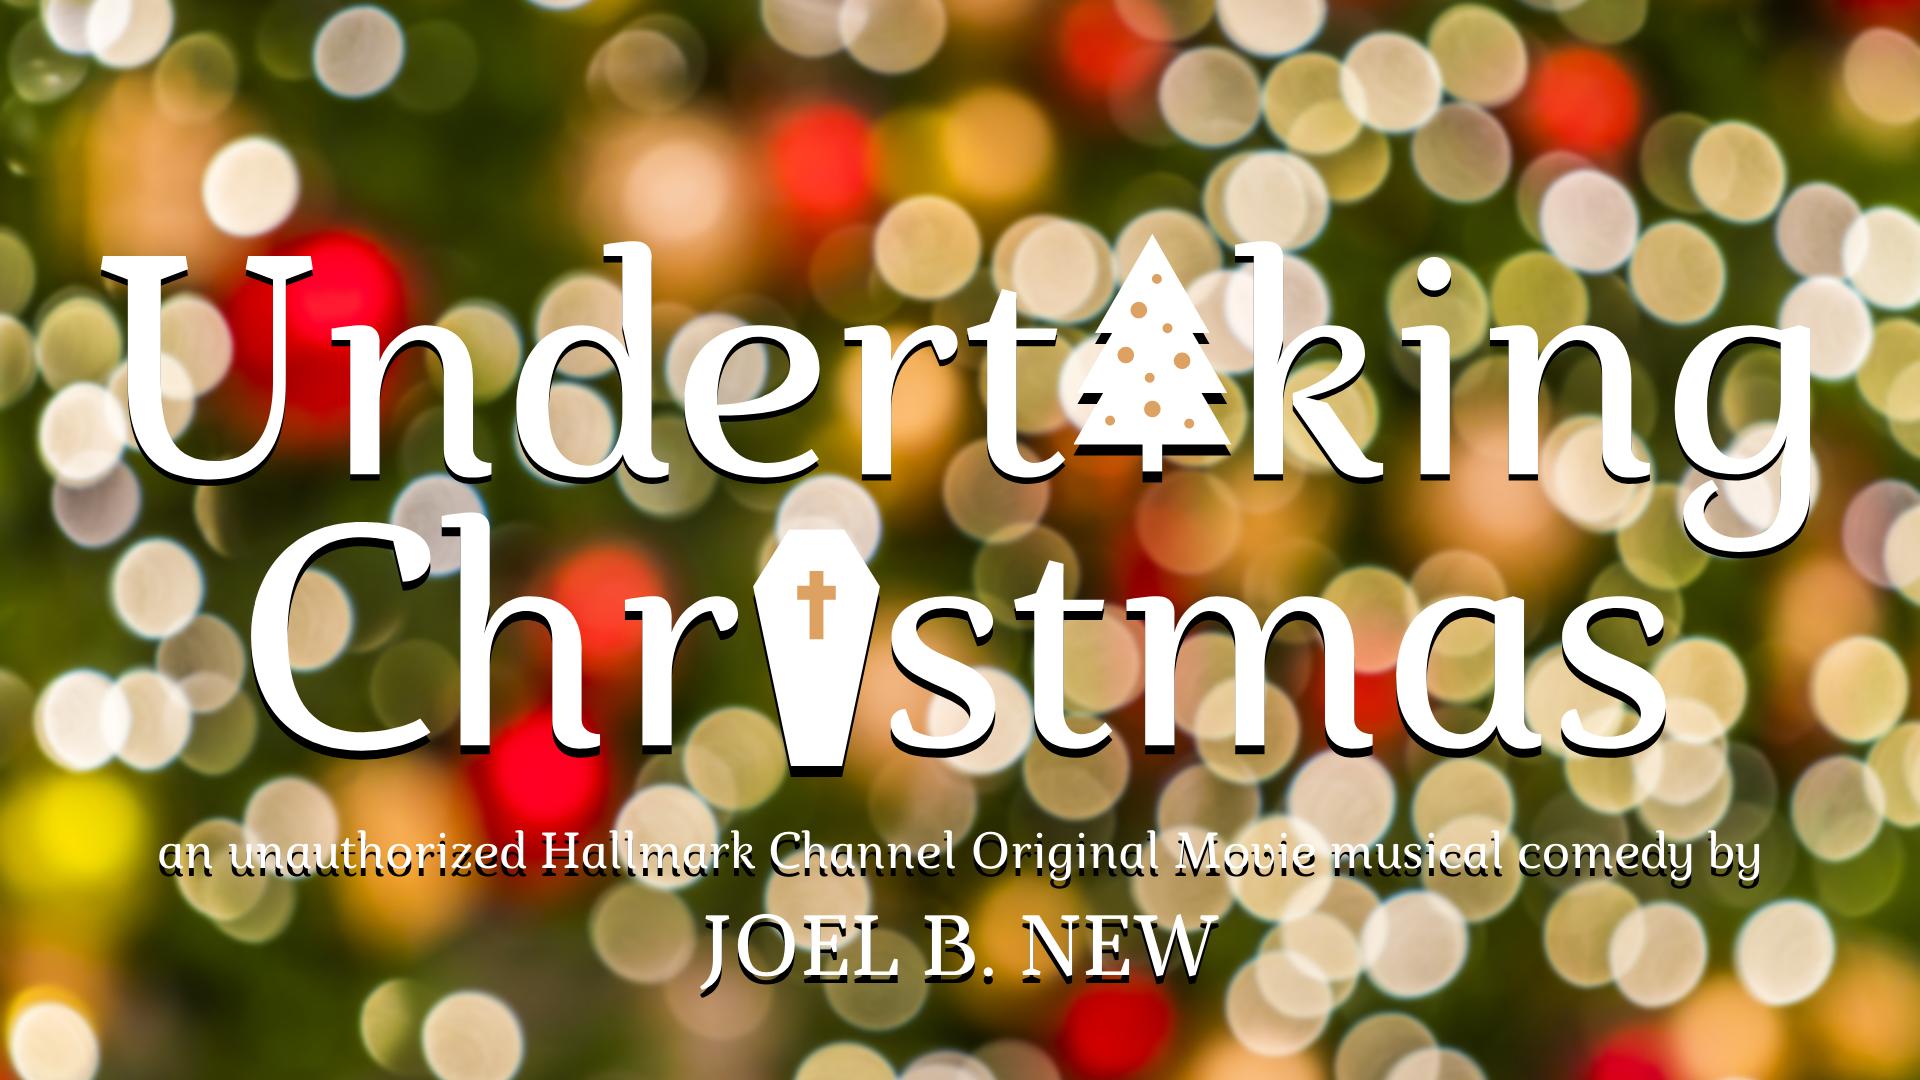 Undertaking Christmas